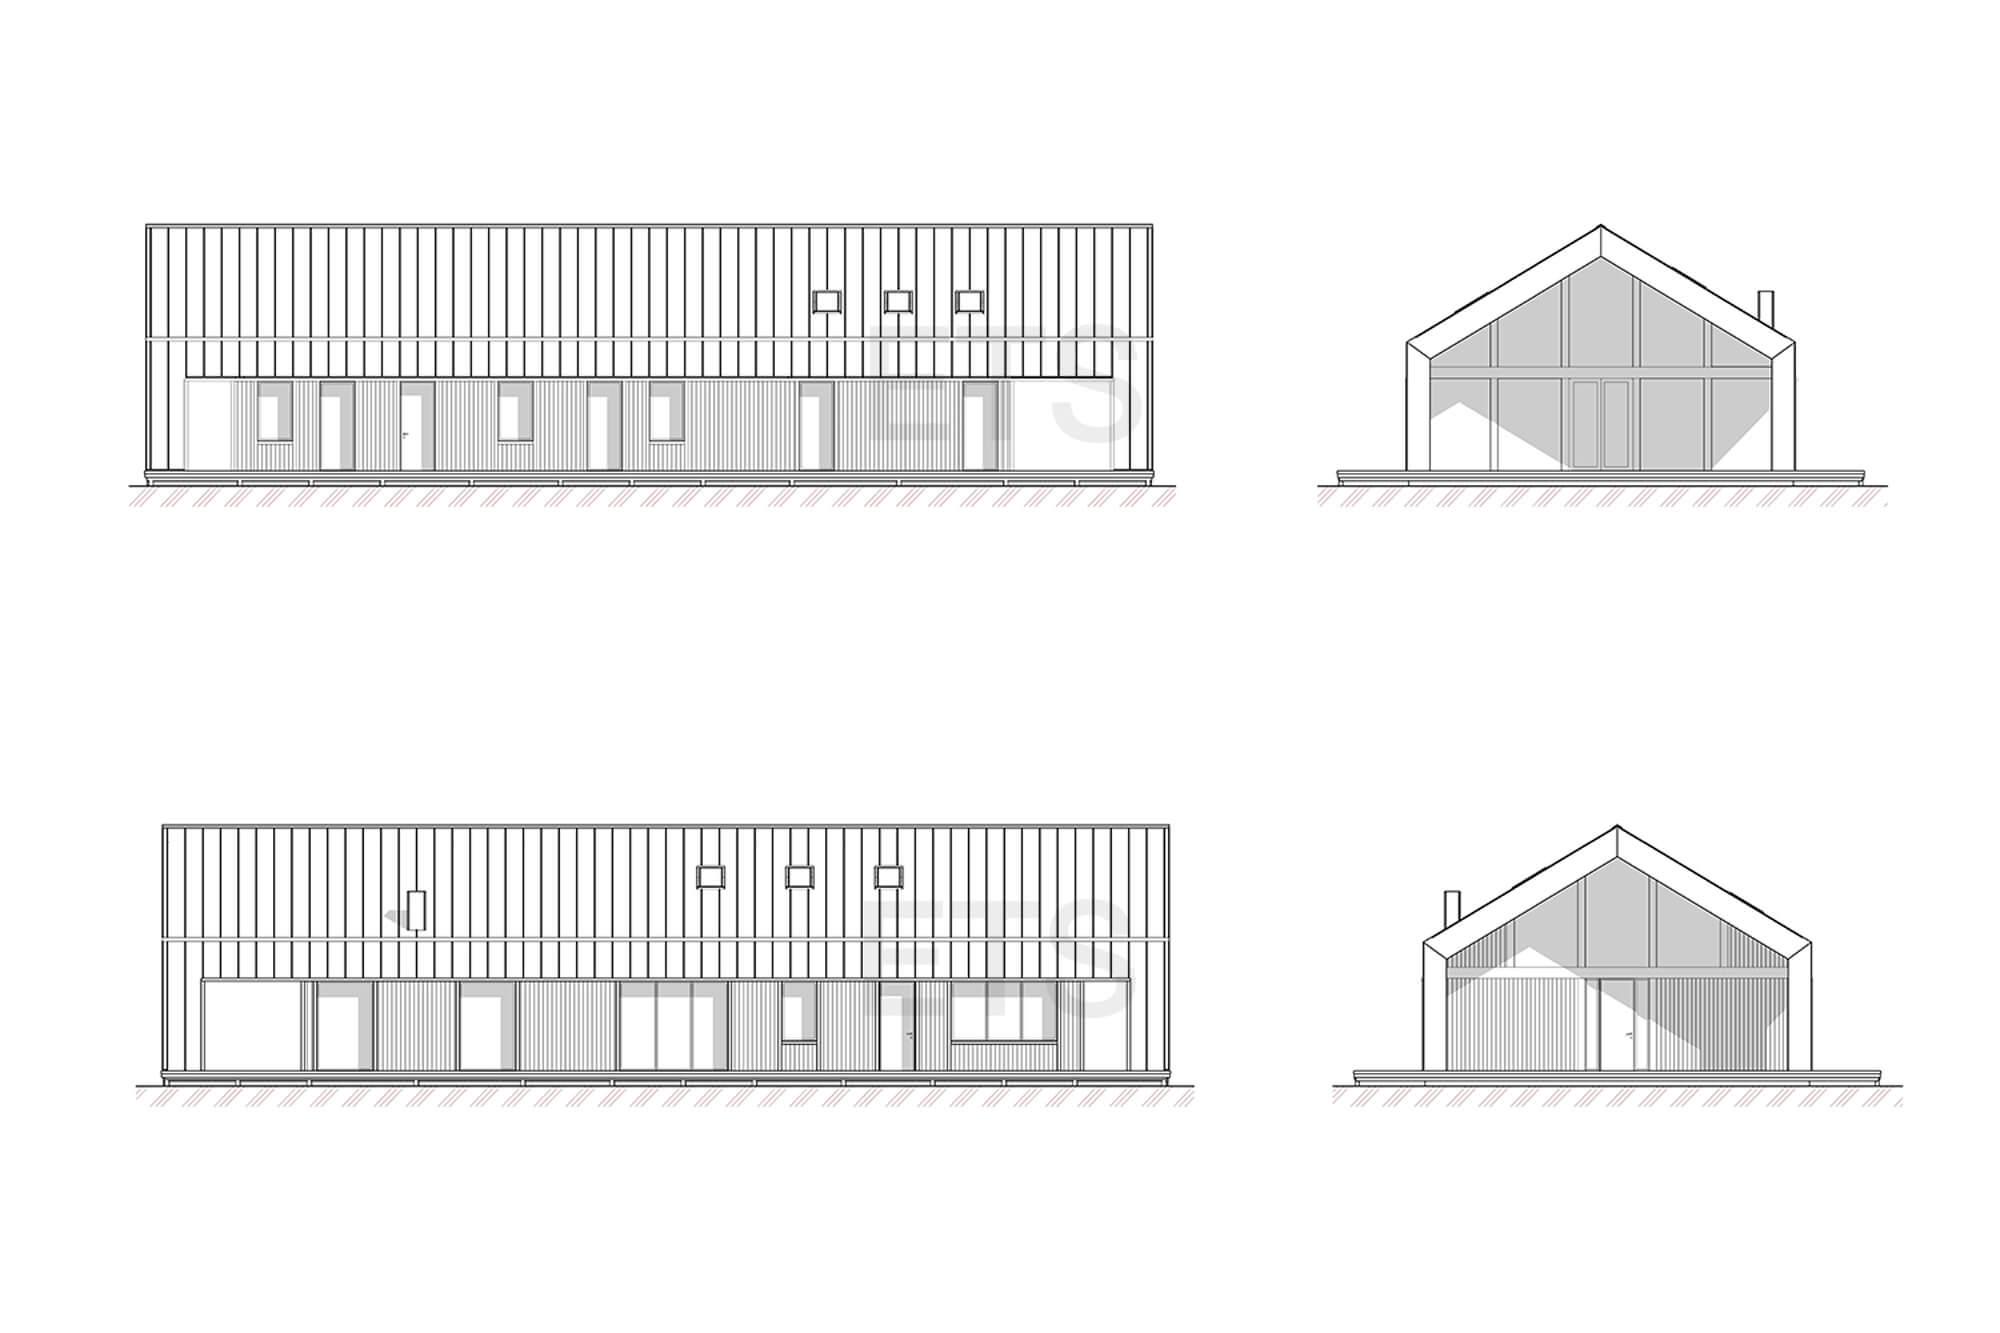 Фасады проекта Барнхаус (Barnhouse) от ETS